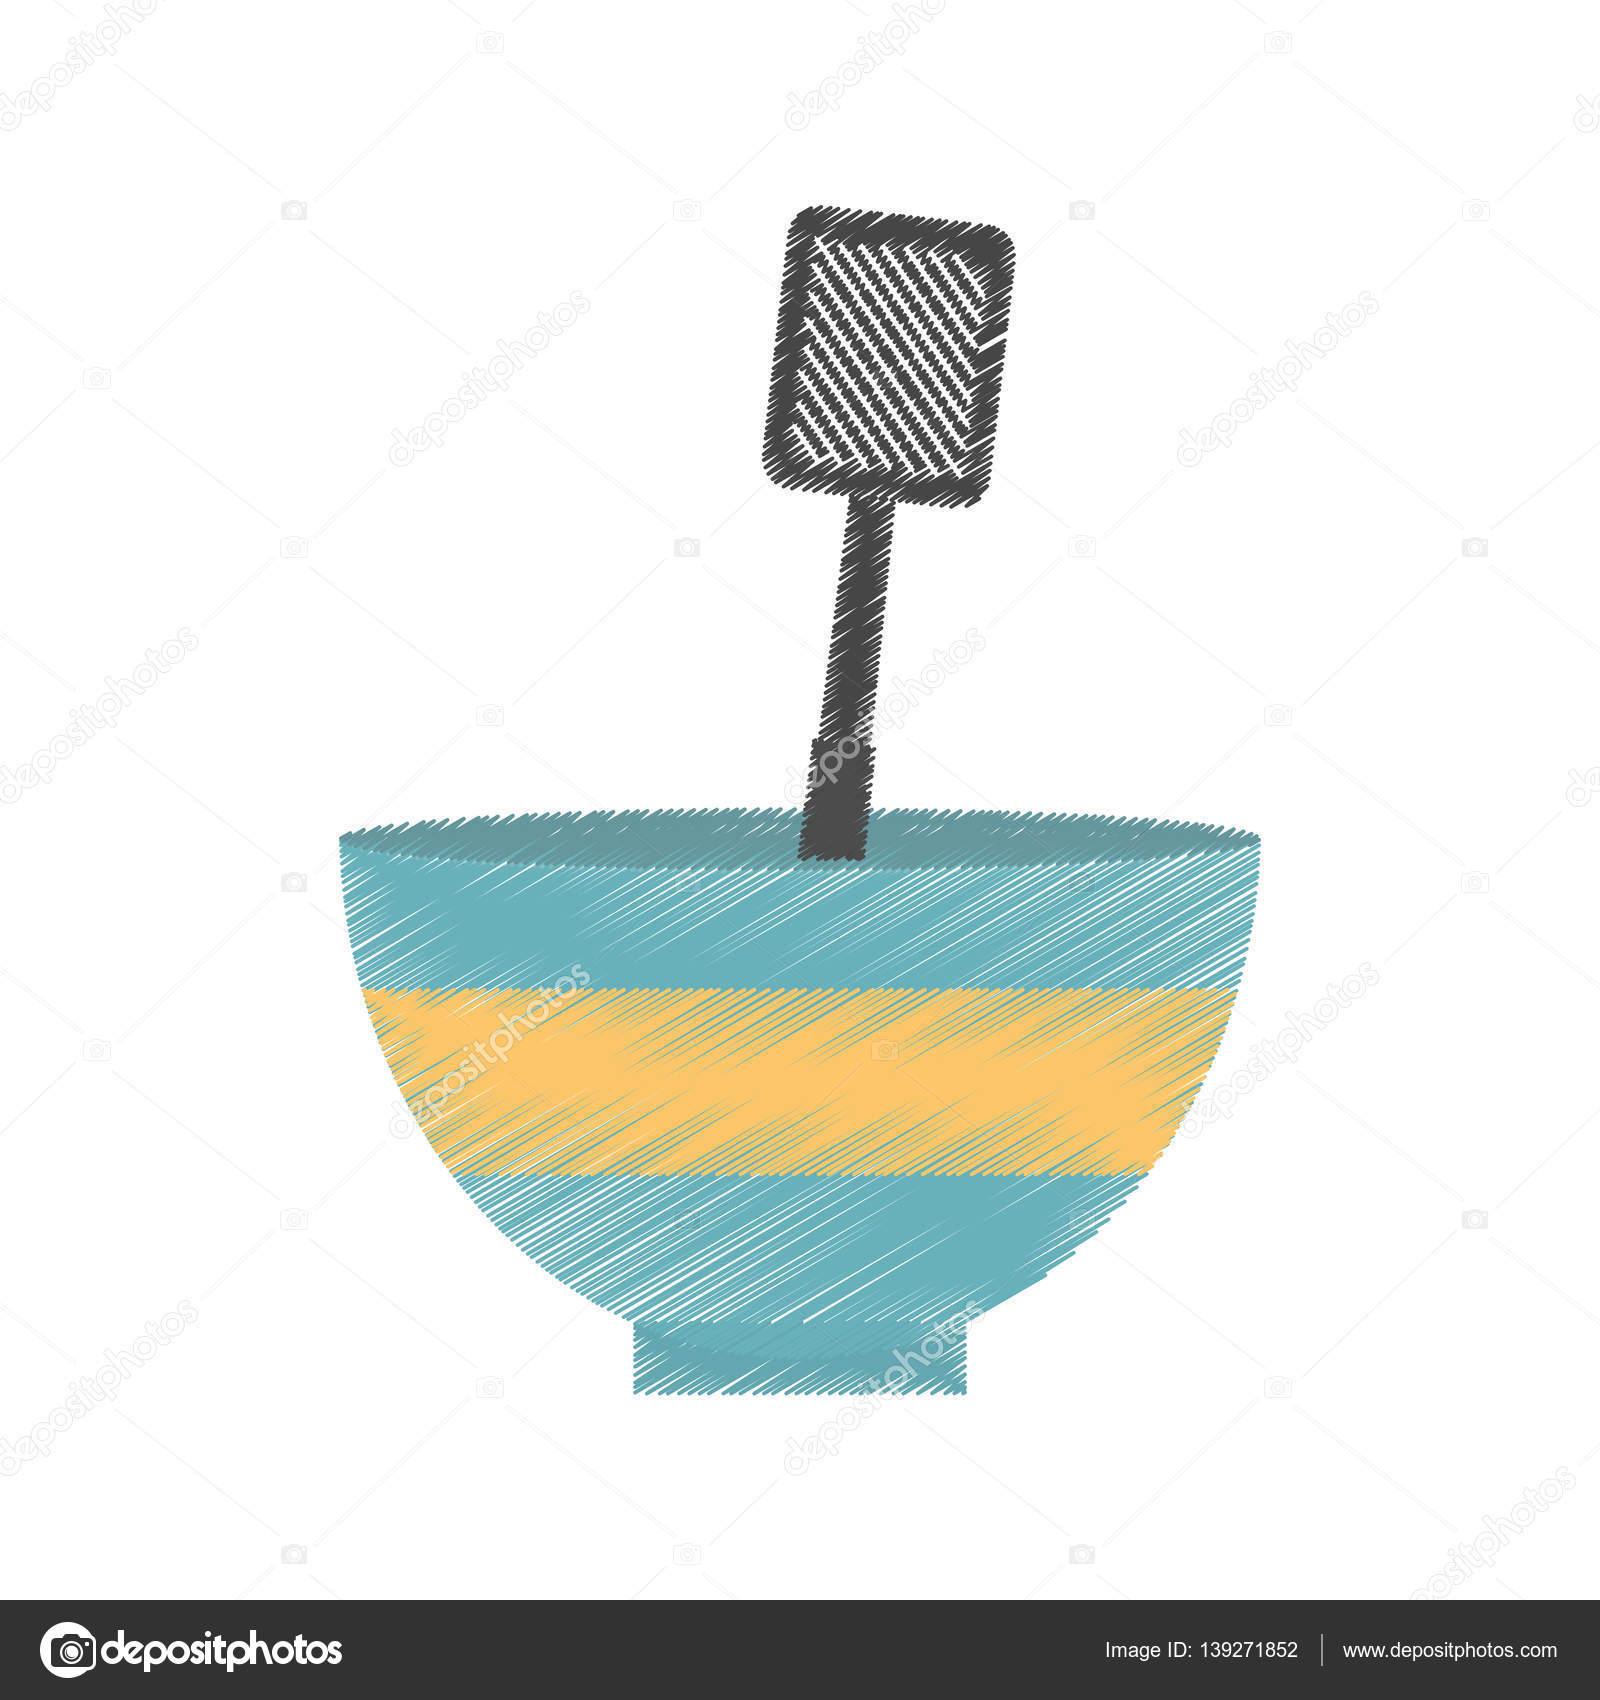 1600x1700 Drawing Bowl Spatula Grill Utensil Kitchen Stock Vector Djv